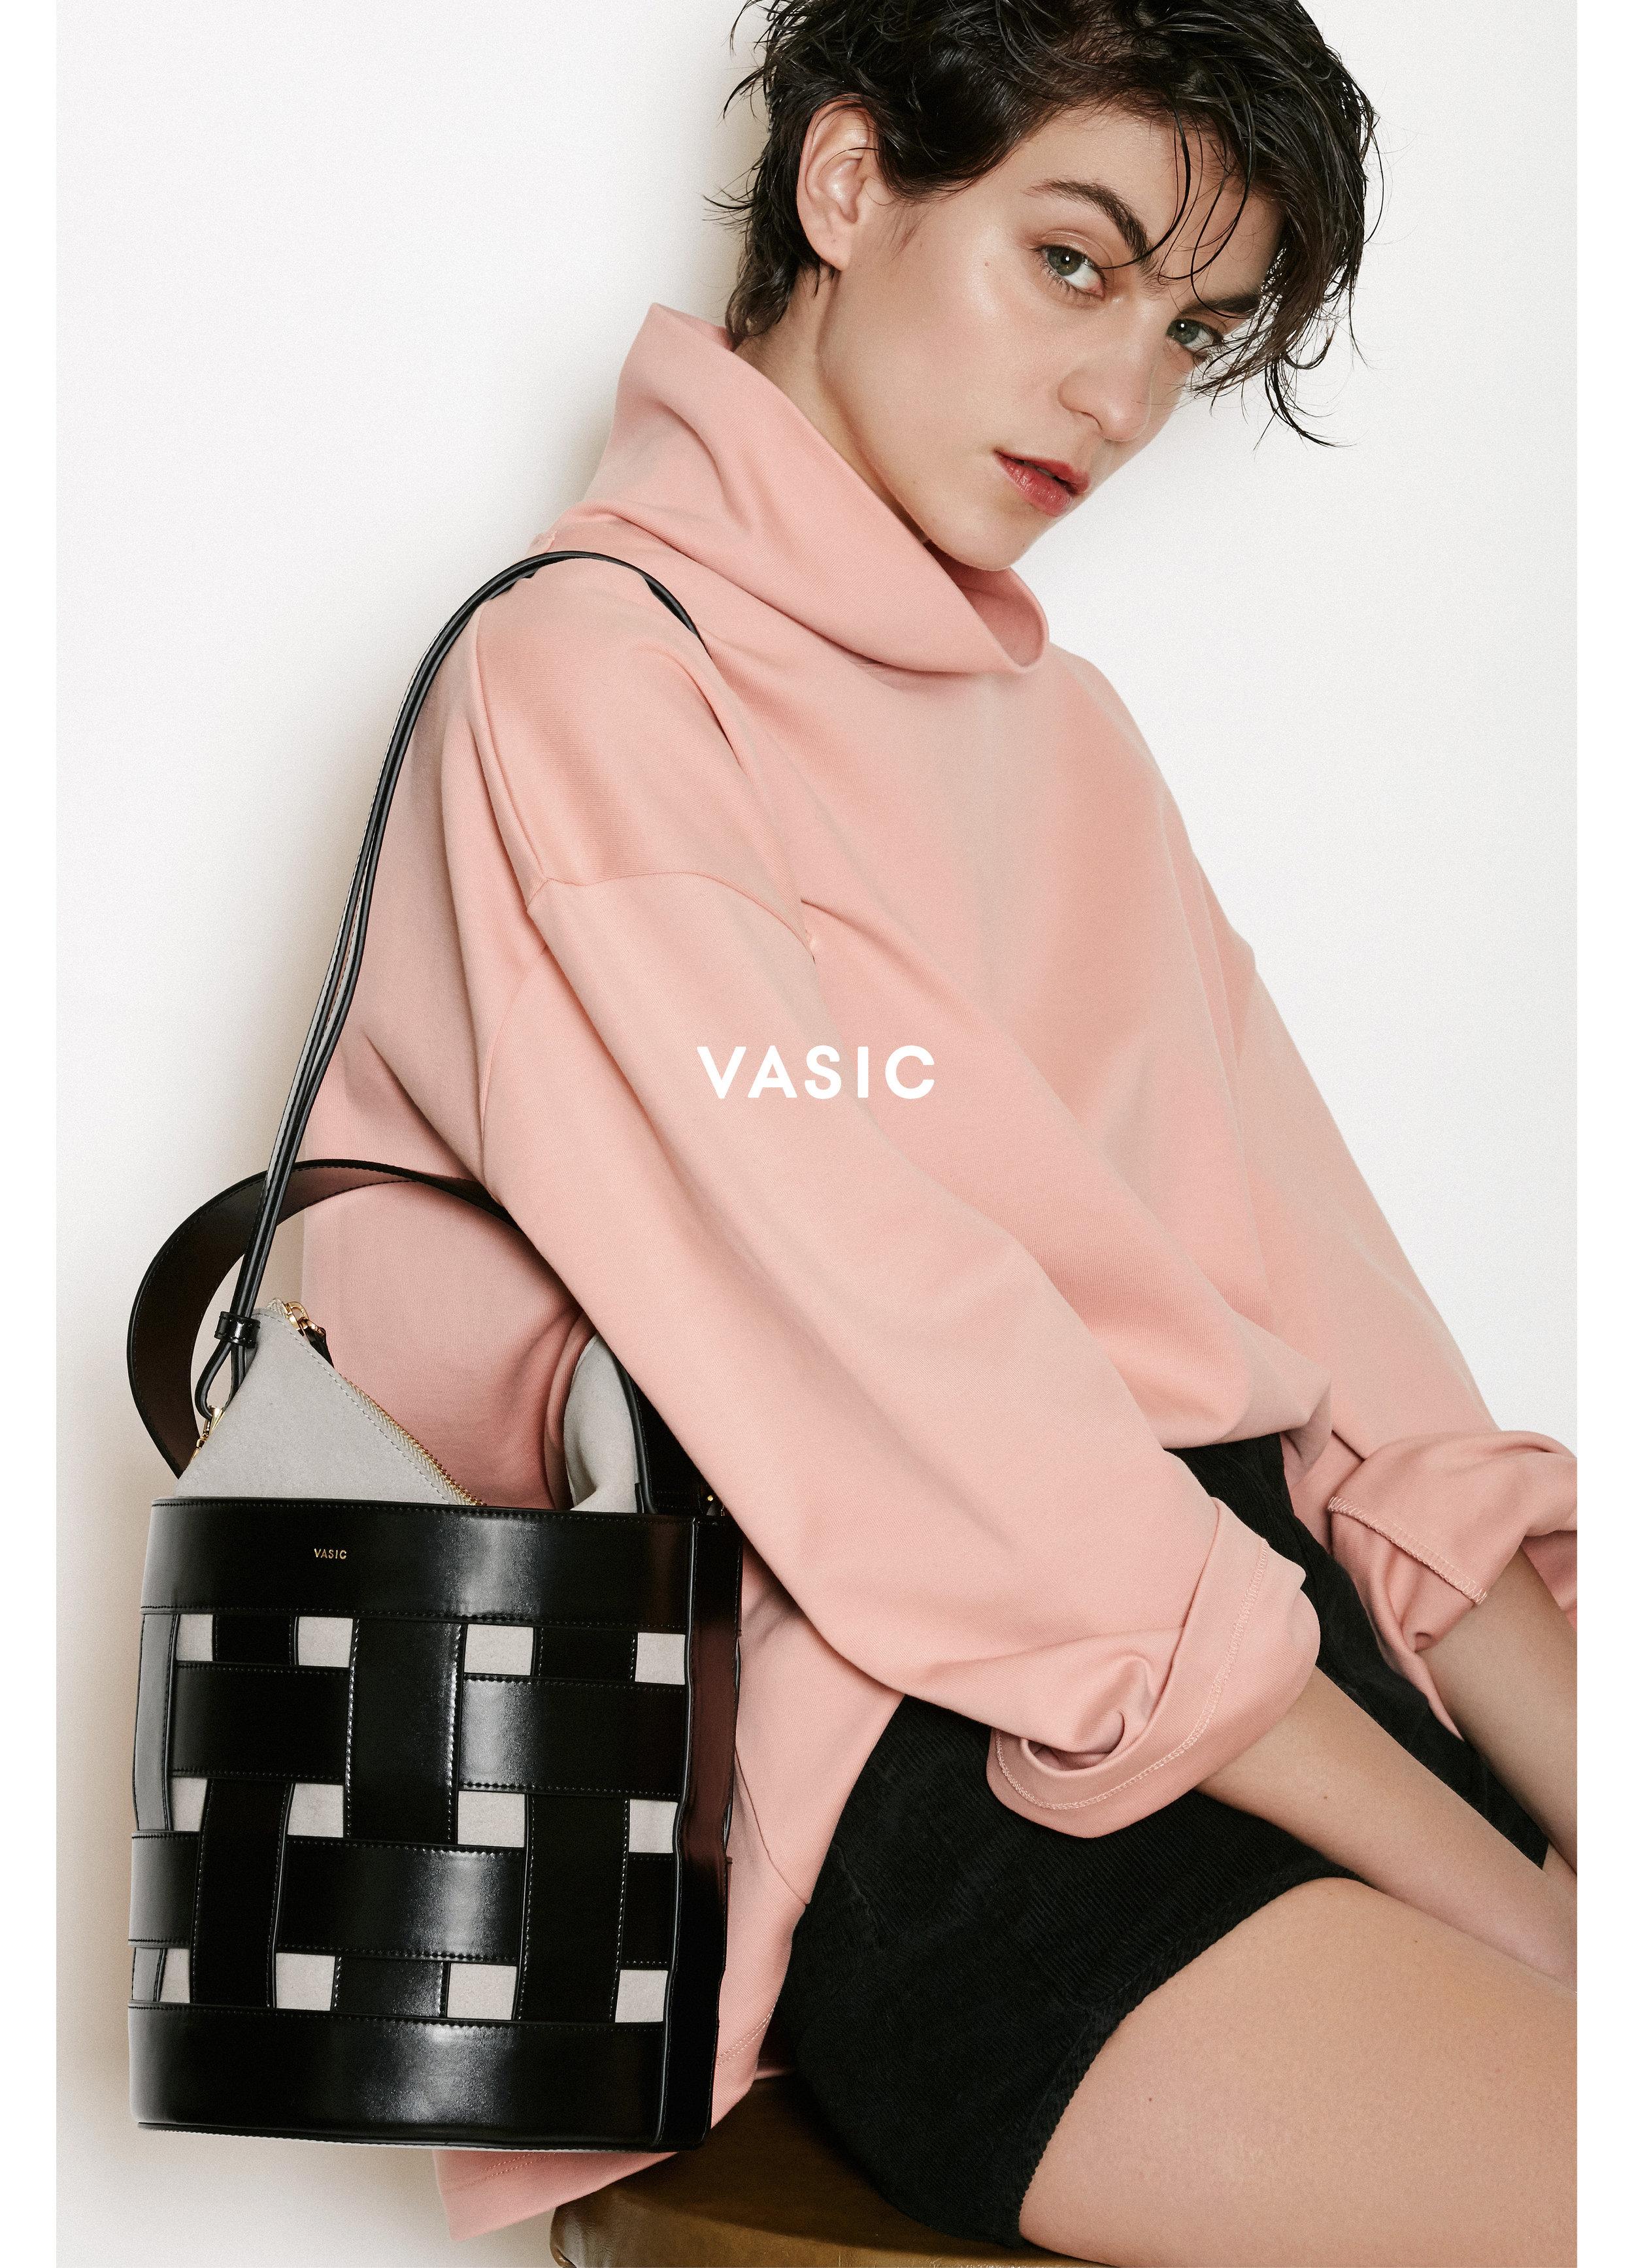 VASIC FW 2017